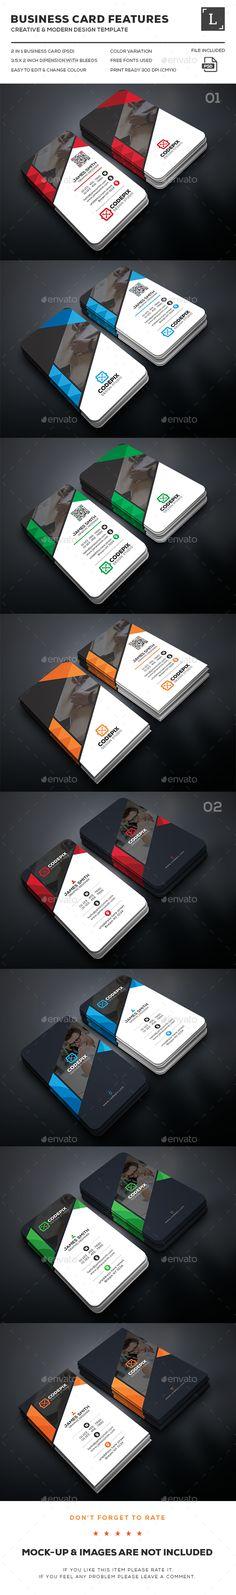 Business Card Bundle Templates PSD. Download here: http://graphicriver.net/item/business-card-bundle/16073031?ref=ksioks